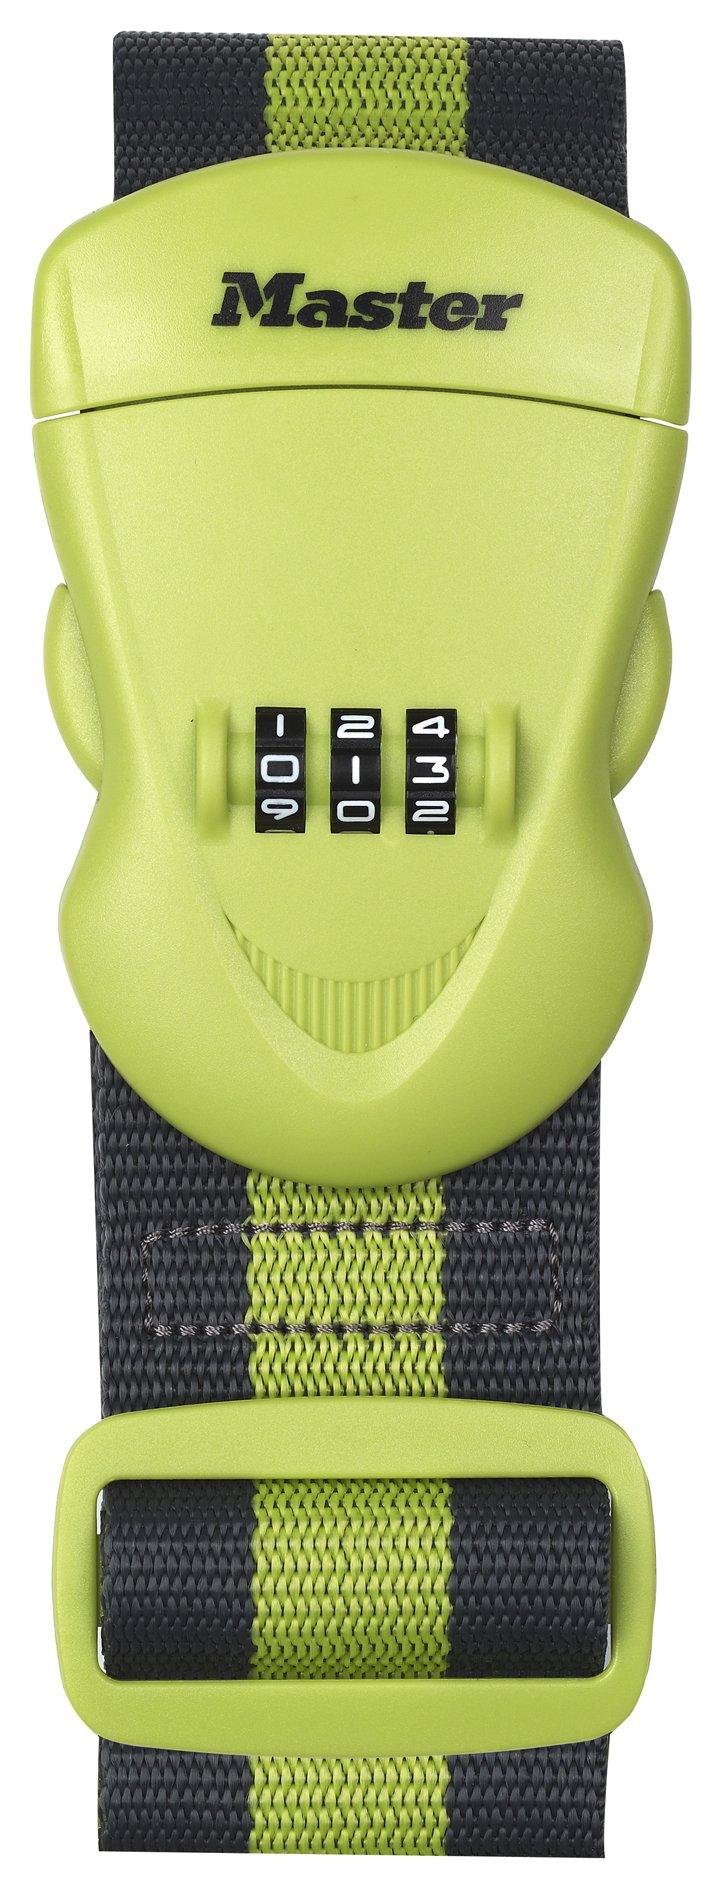 Master Lock - Combination Lock Strap lowest price